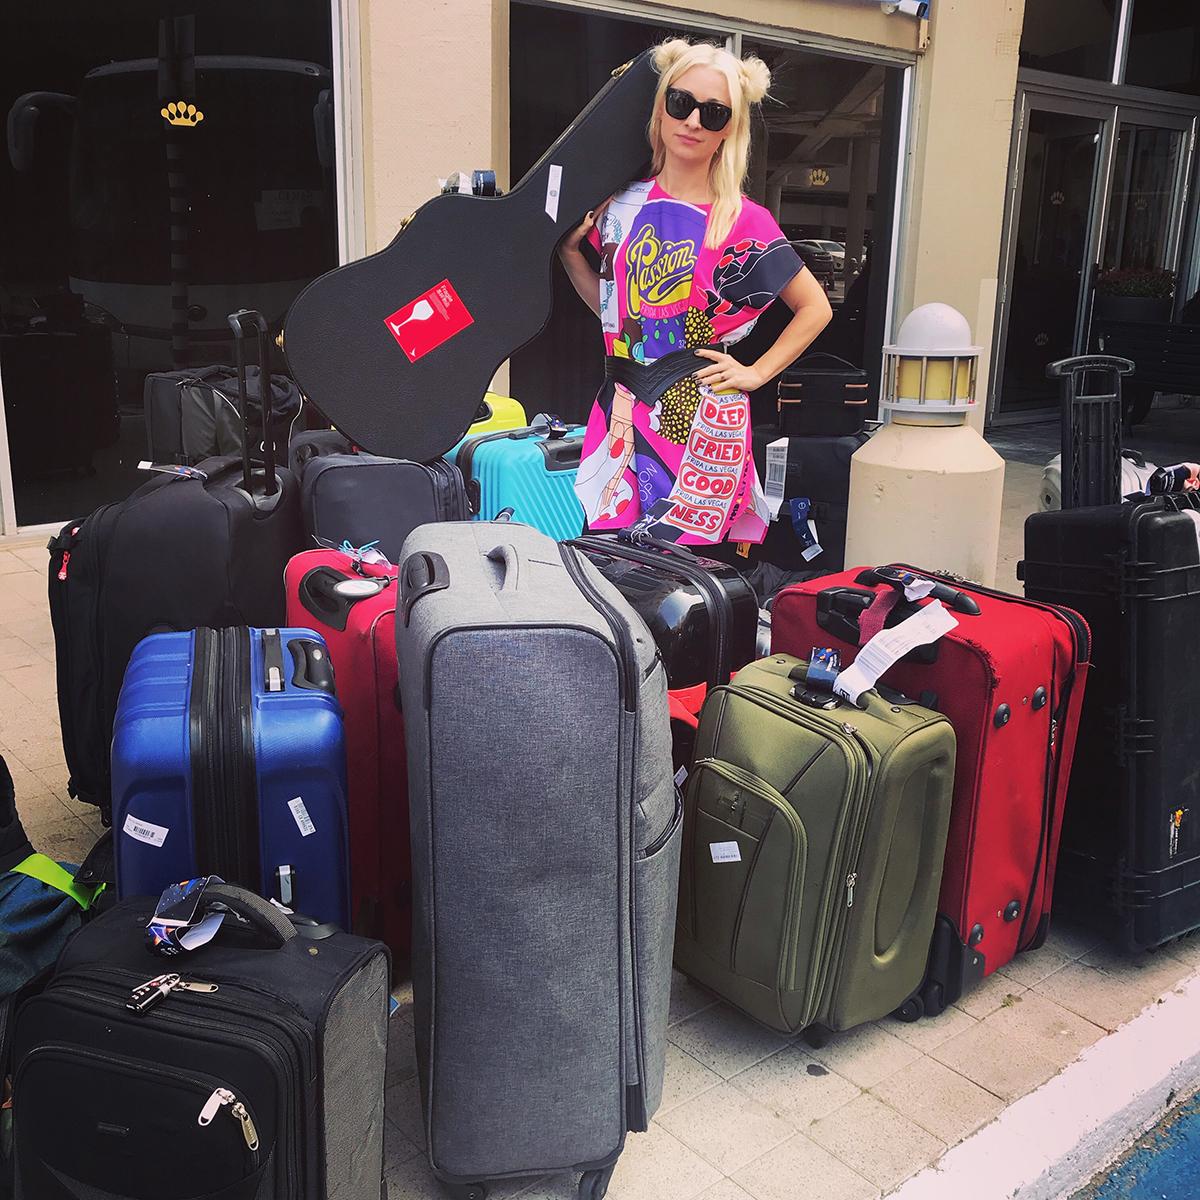 KateMillerHeidke_Eurovision_2019_FridaLasVegas_GlamourSack_MilkBarDreams_Australian_Fashion_Designer